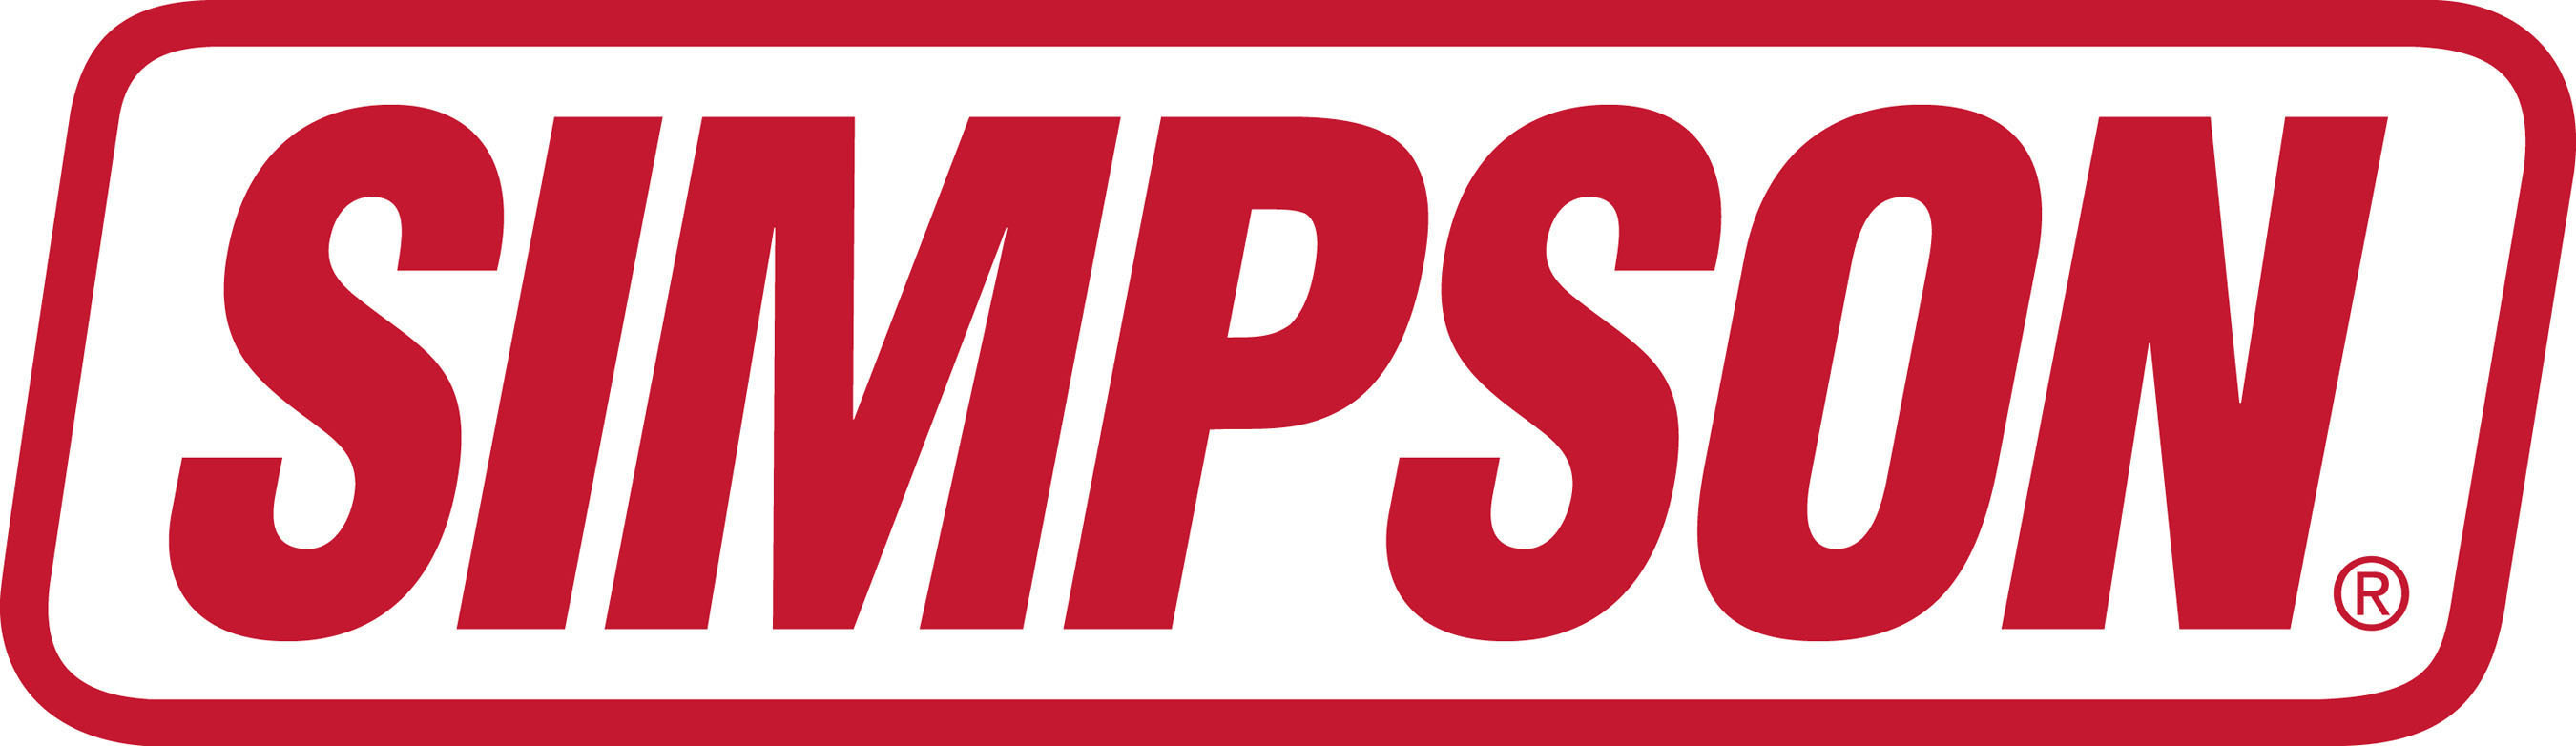 NCMA Pavement Sprint Car Series